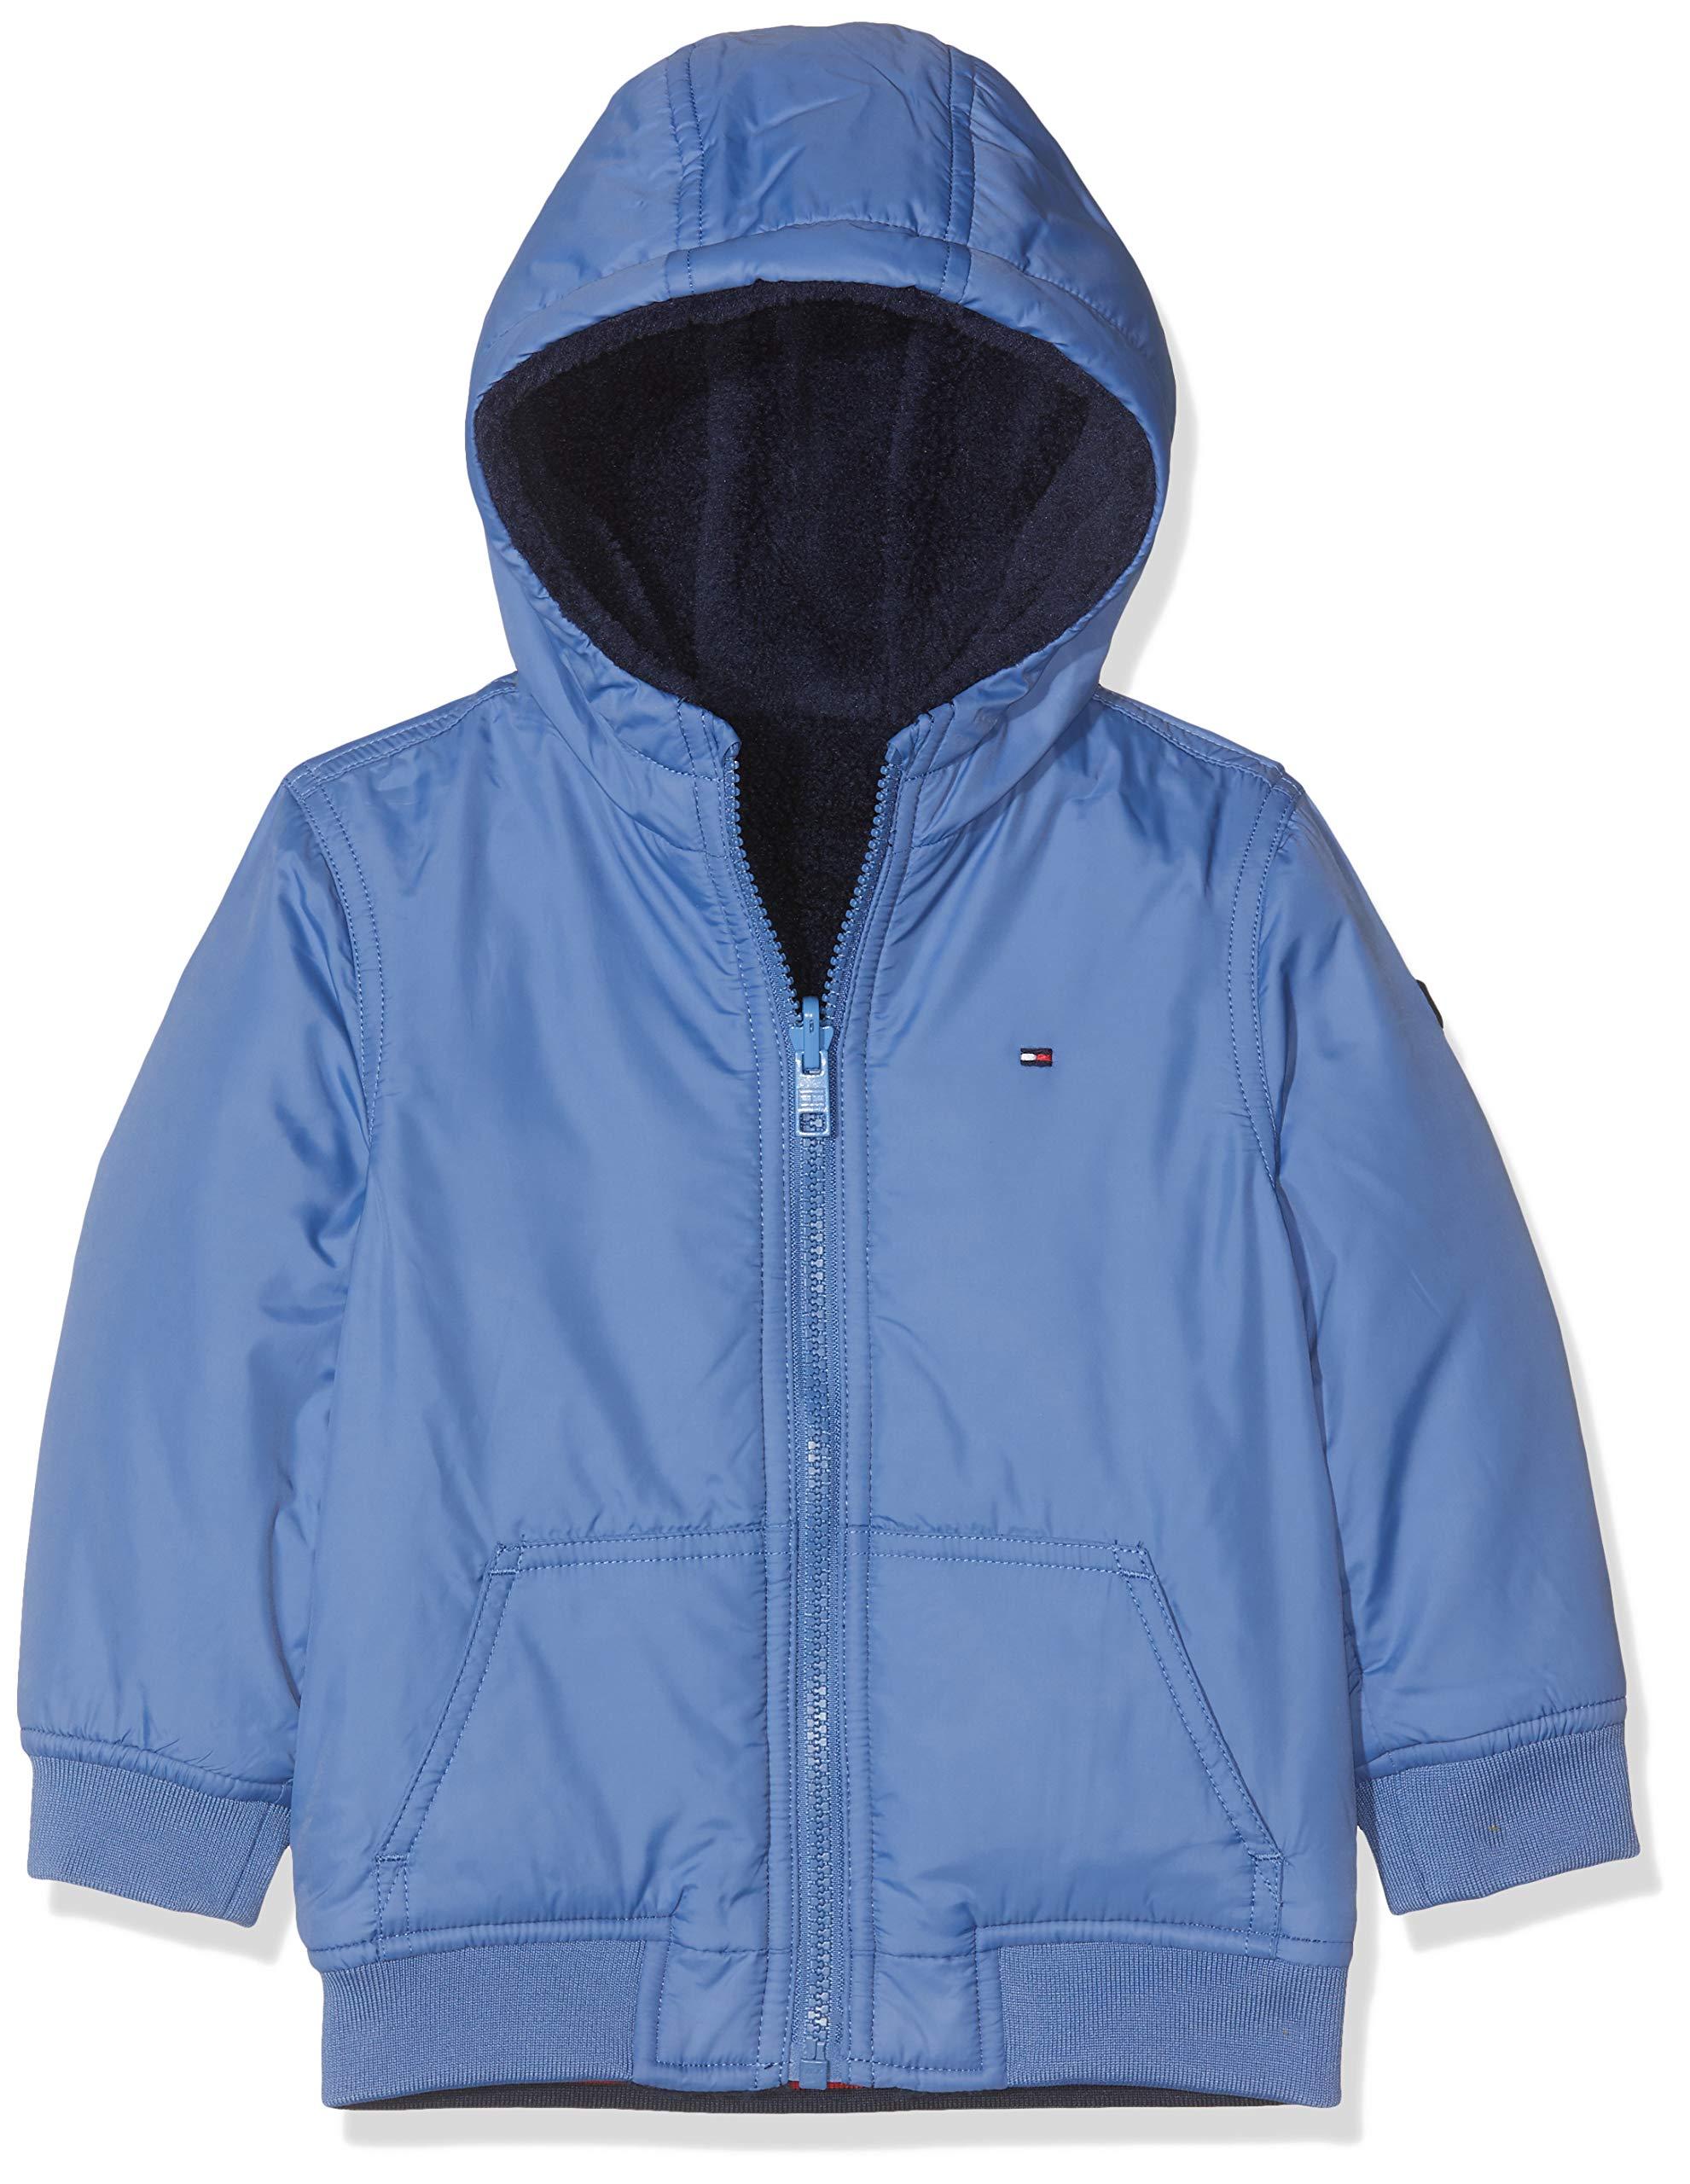 Tommy Hilfiger Reversible Teddy Jacket Chaqueta para Bebés 1